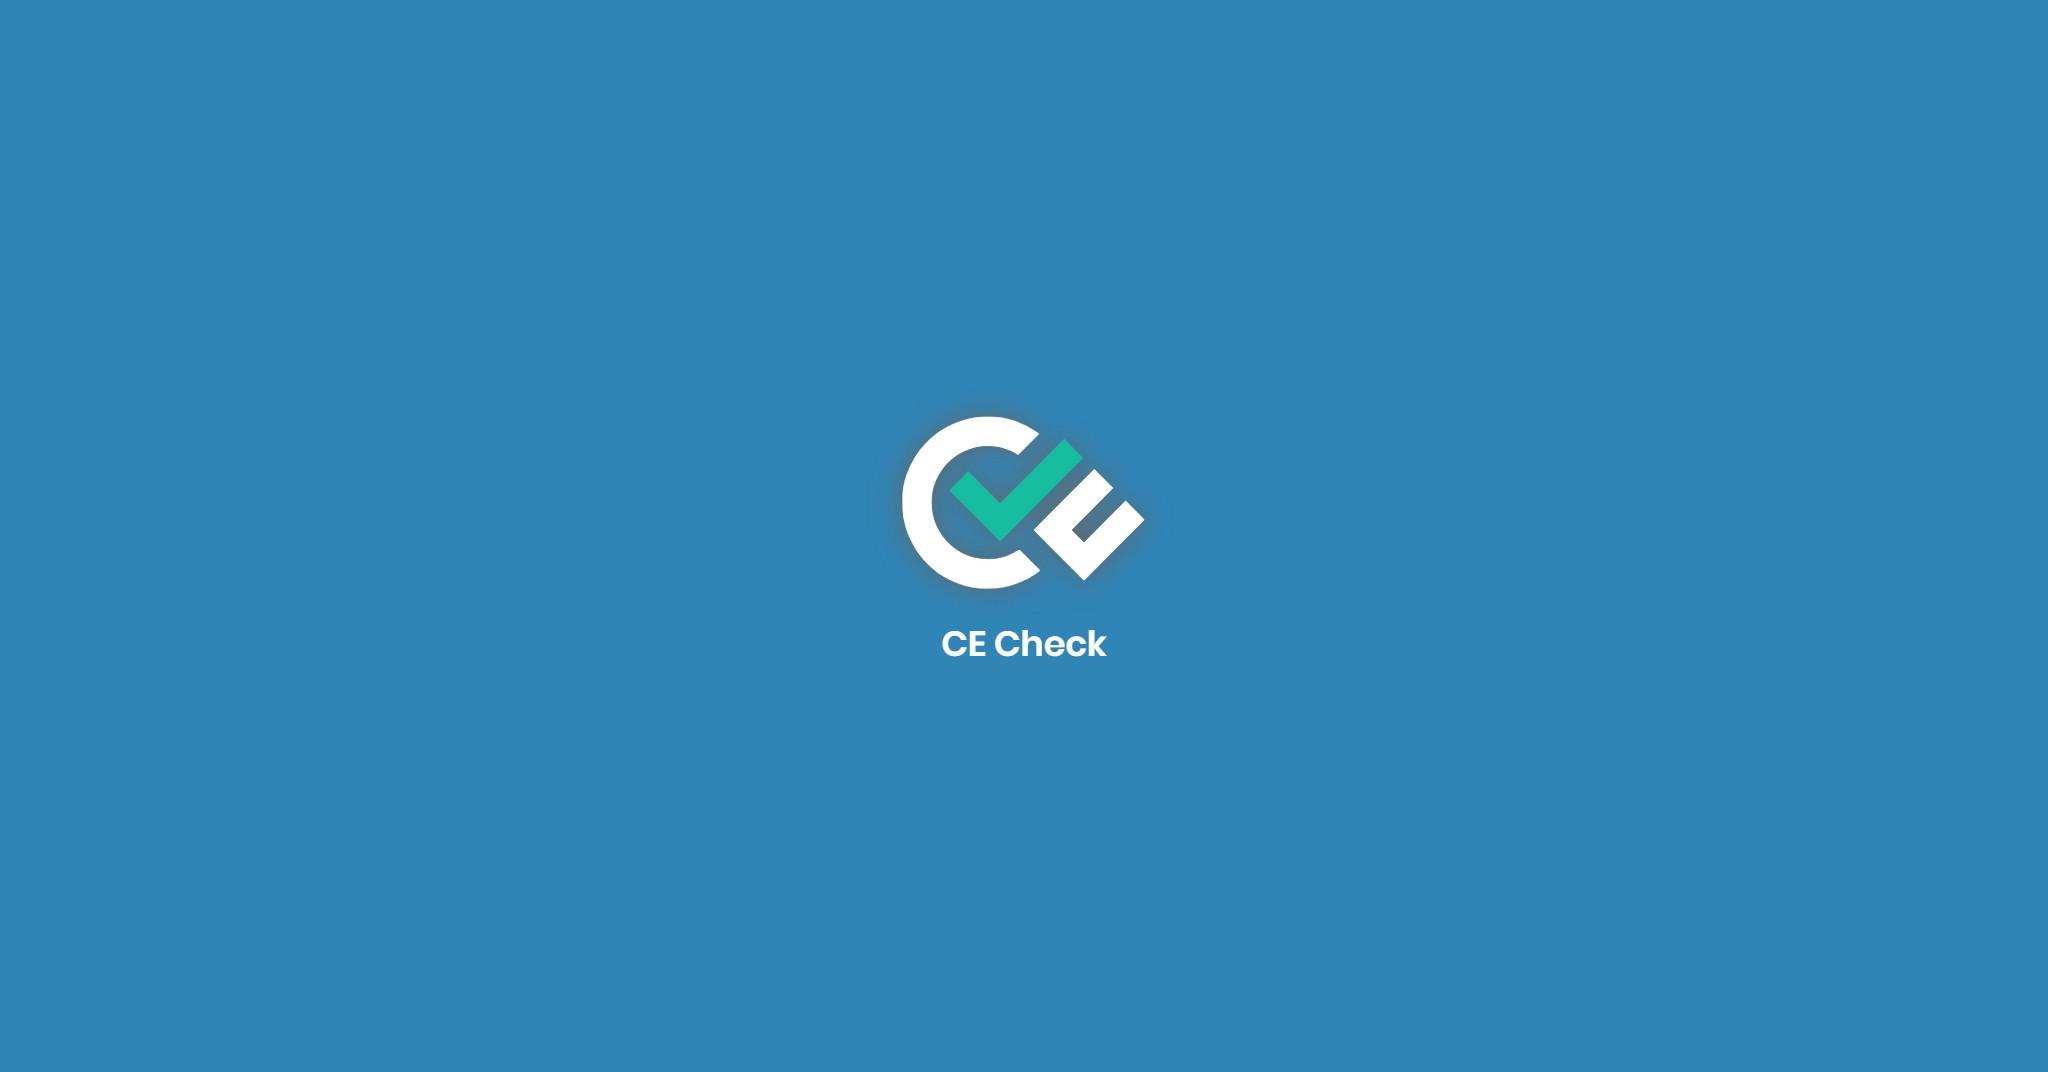 CE Check